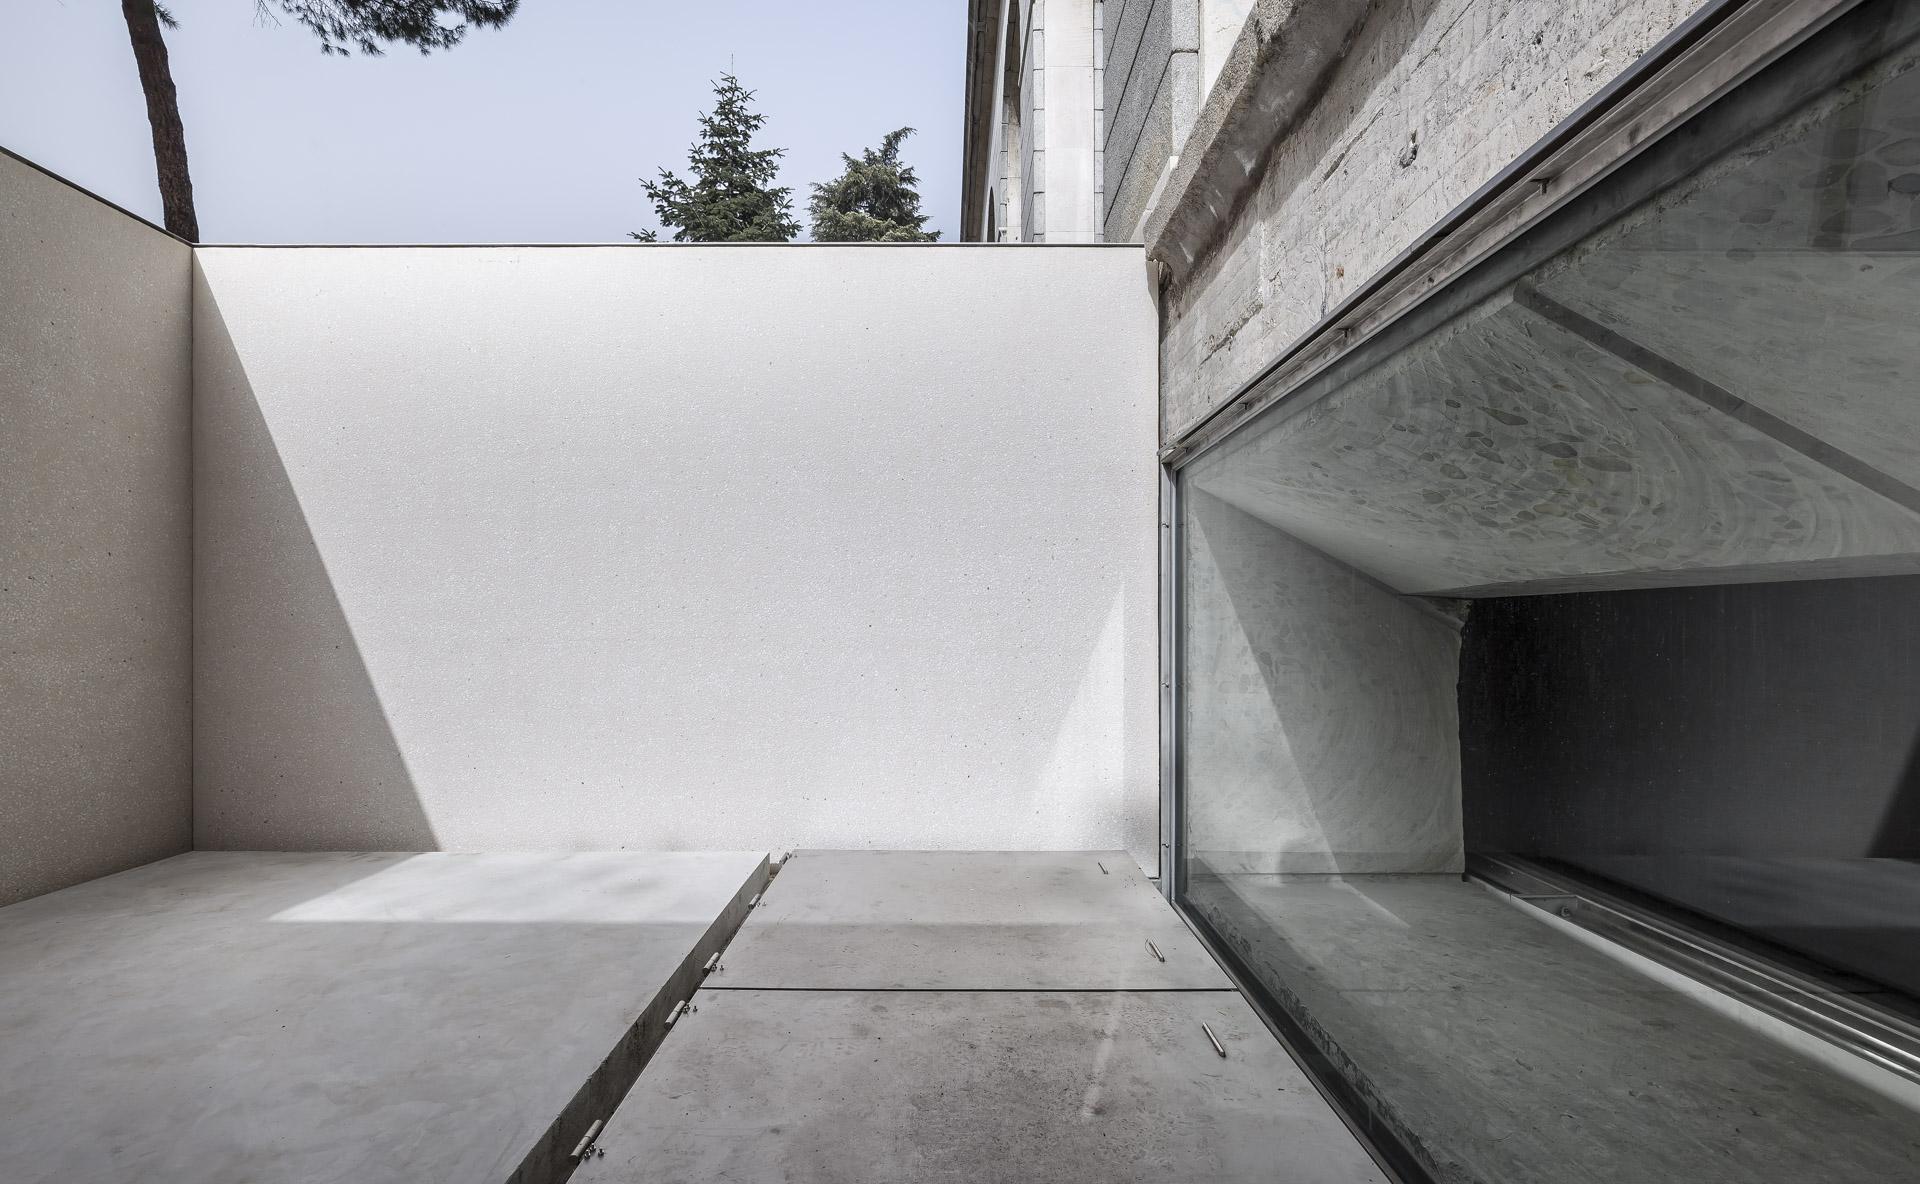 fotografia-arquitectura-madrid-nuevos-ministerios-elorza-german-cabo-09